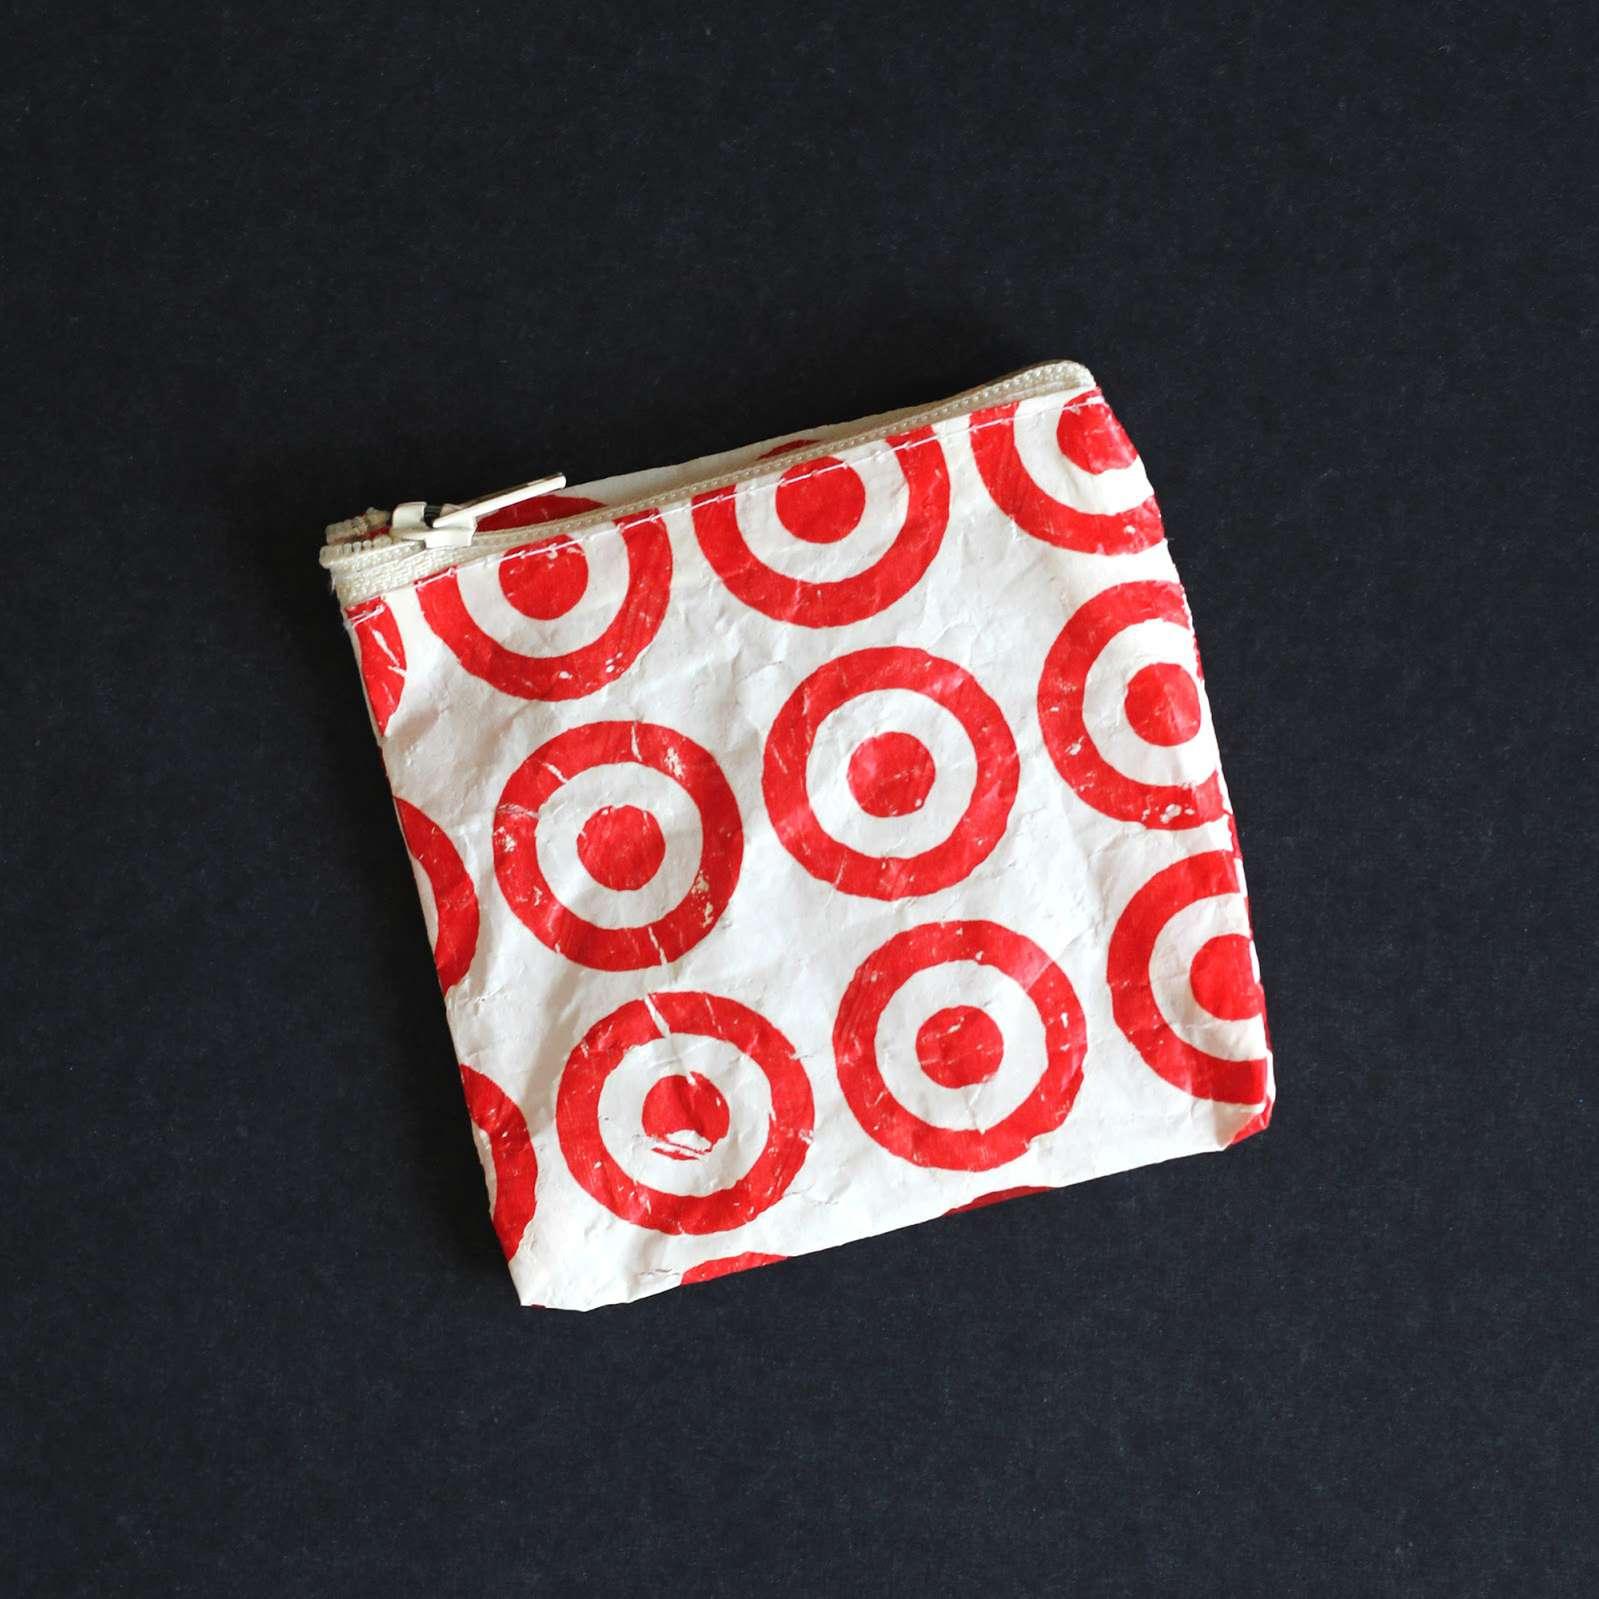 DIY plastic bag coin purse.